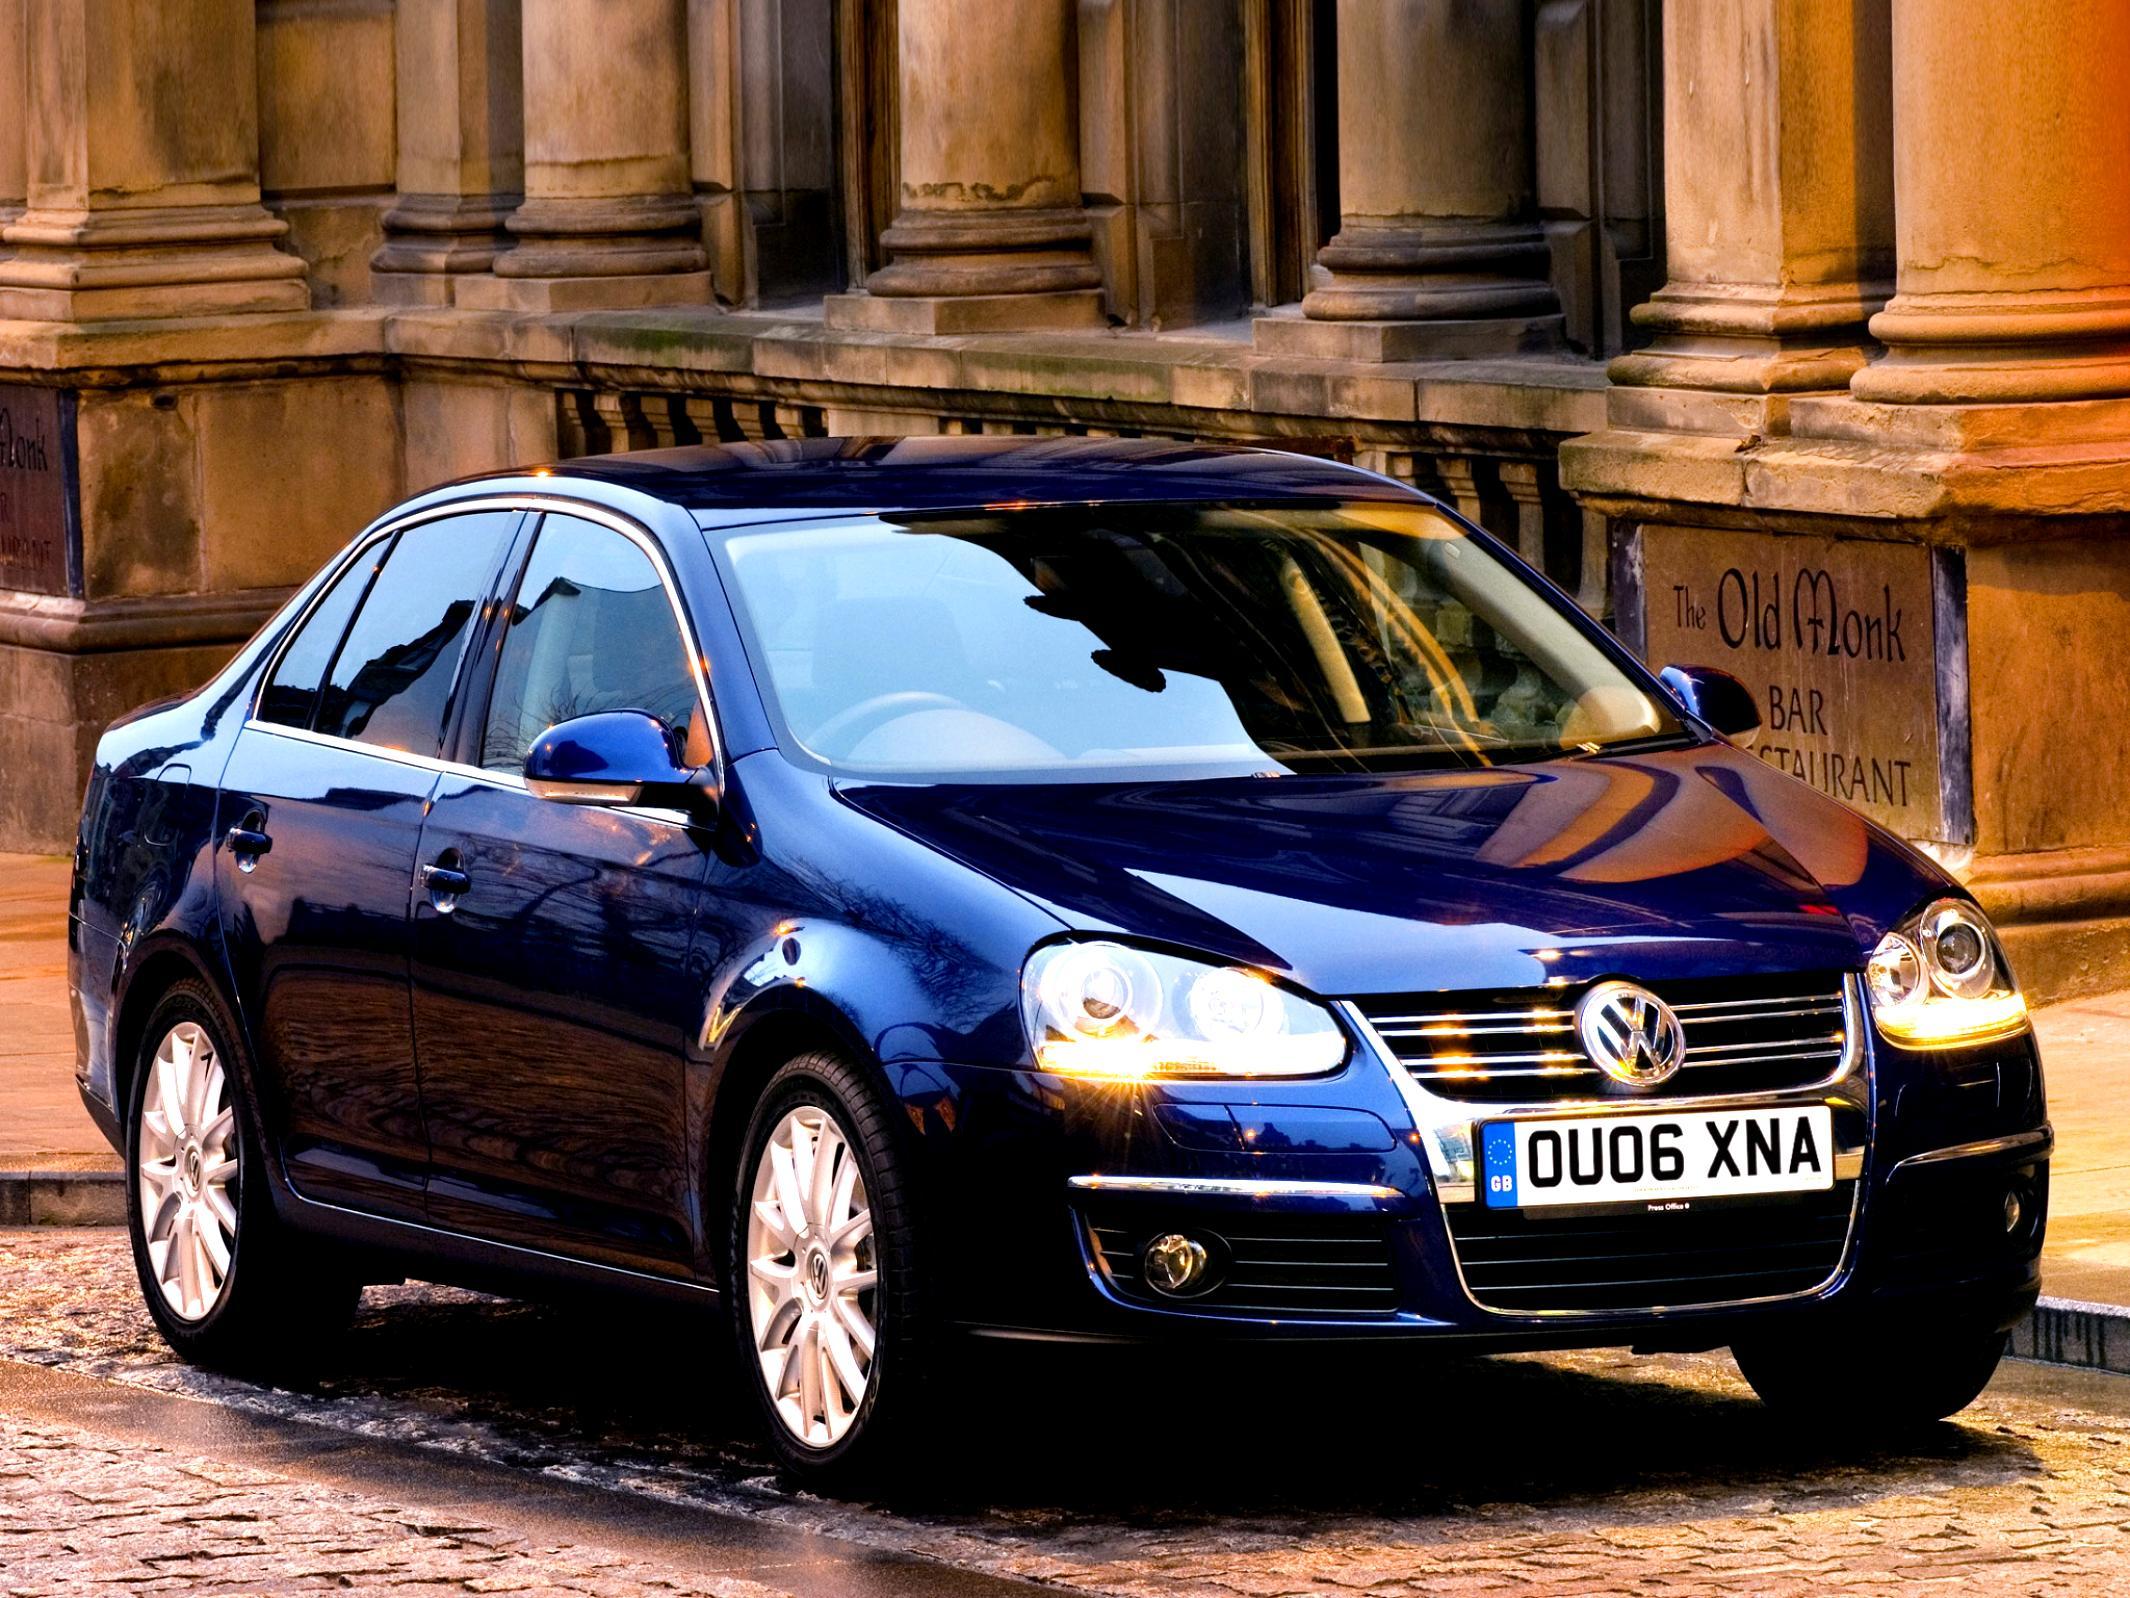 Volkswagen Jetta - Car and Driver